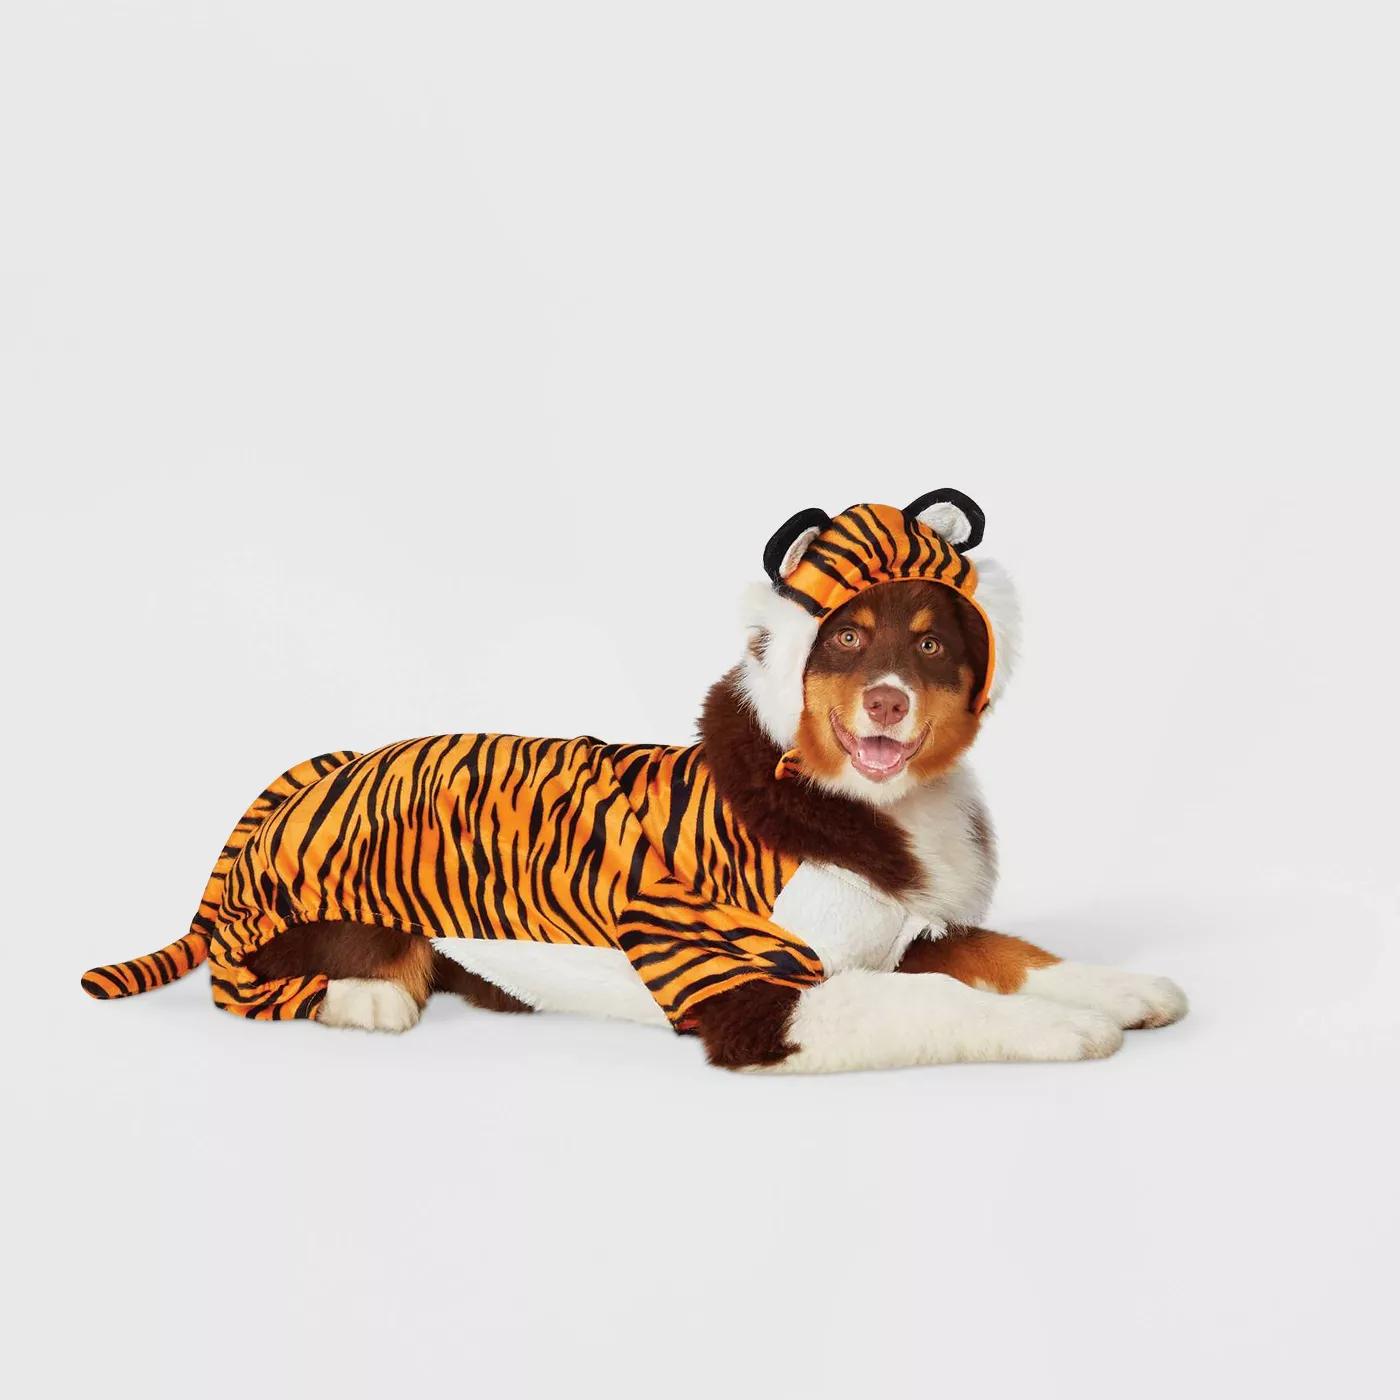 brown dog wearing an orange tiger halloween costume